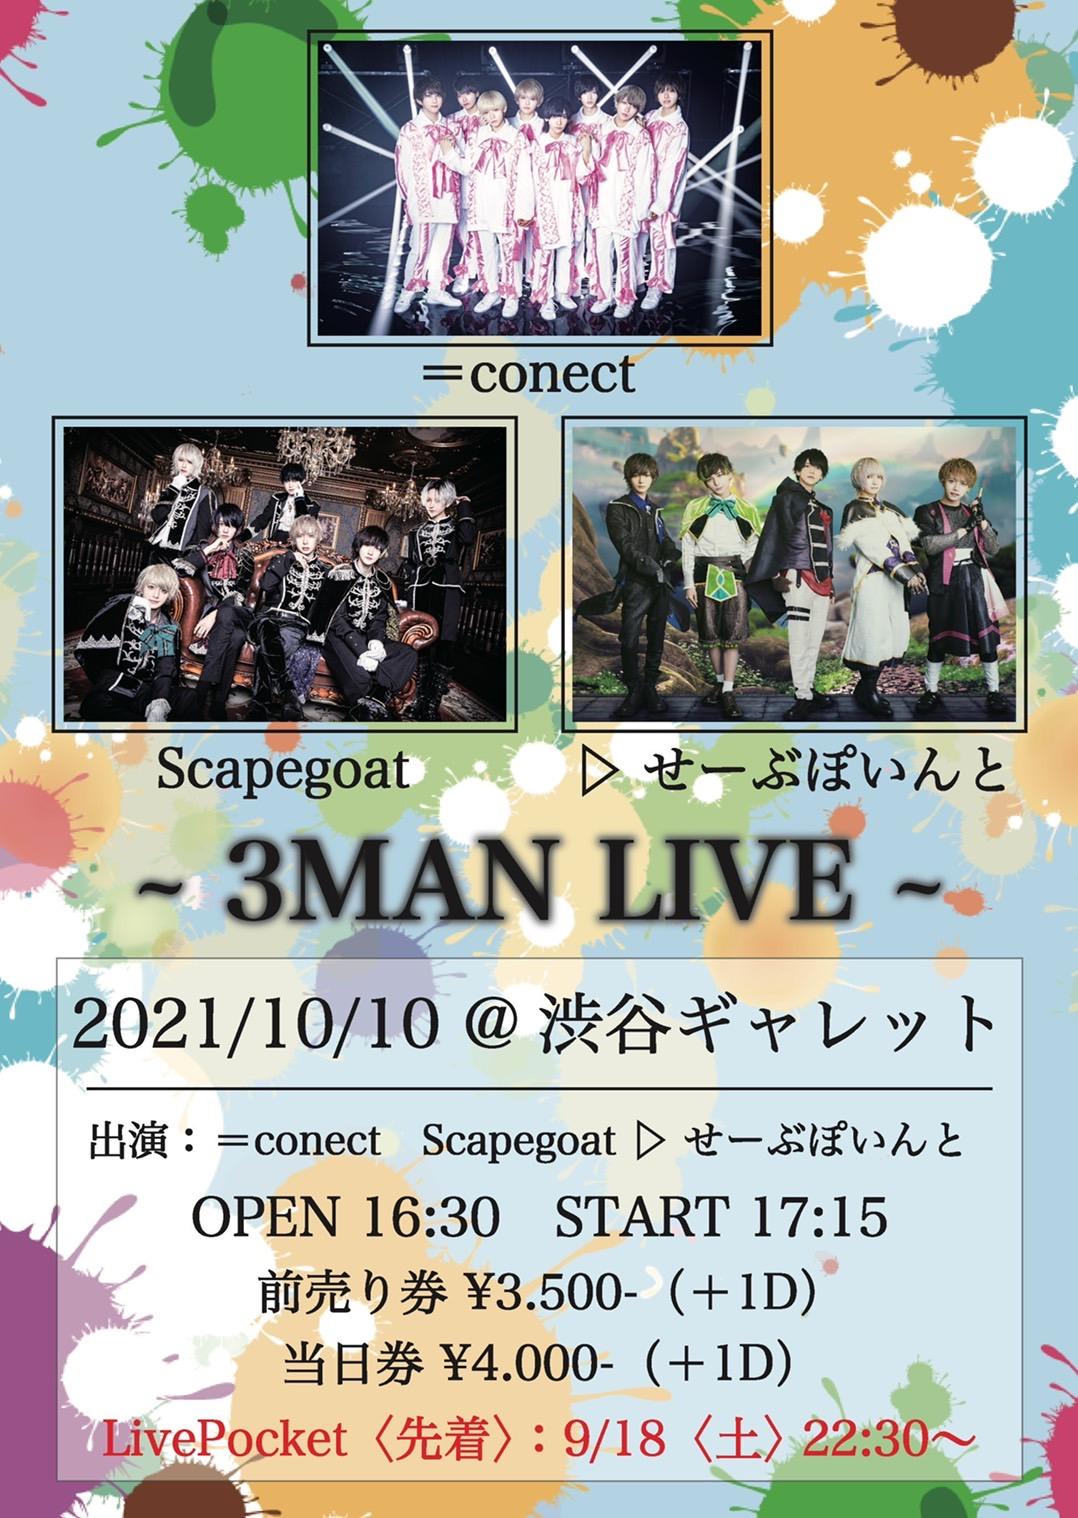 『=conect×Scapegoat×▷ せーぶぽいんと 3MAN LIVE』